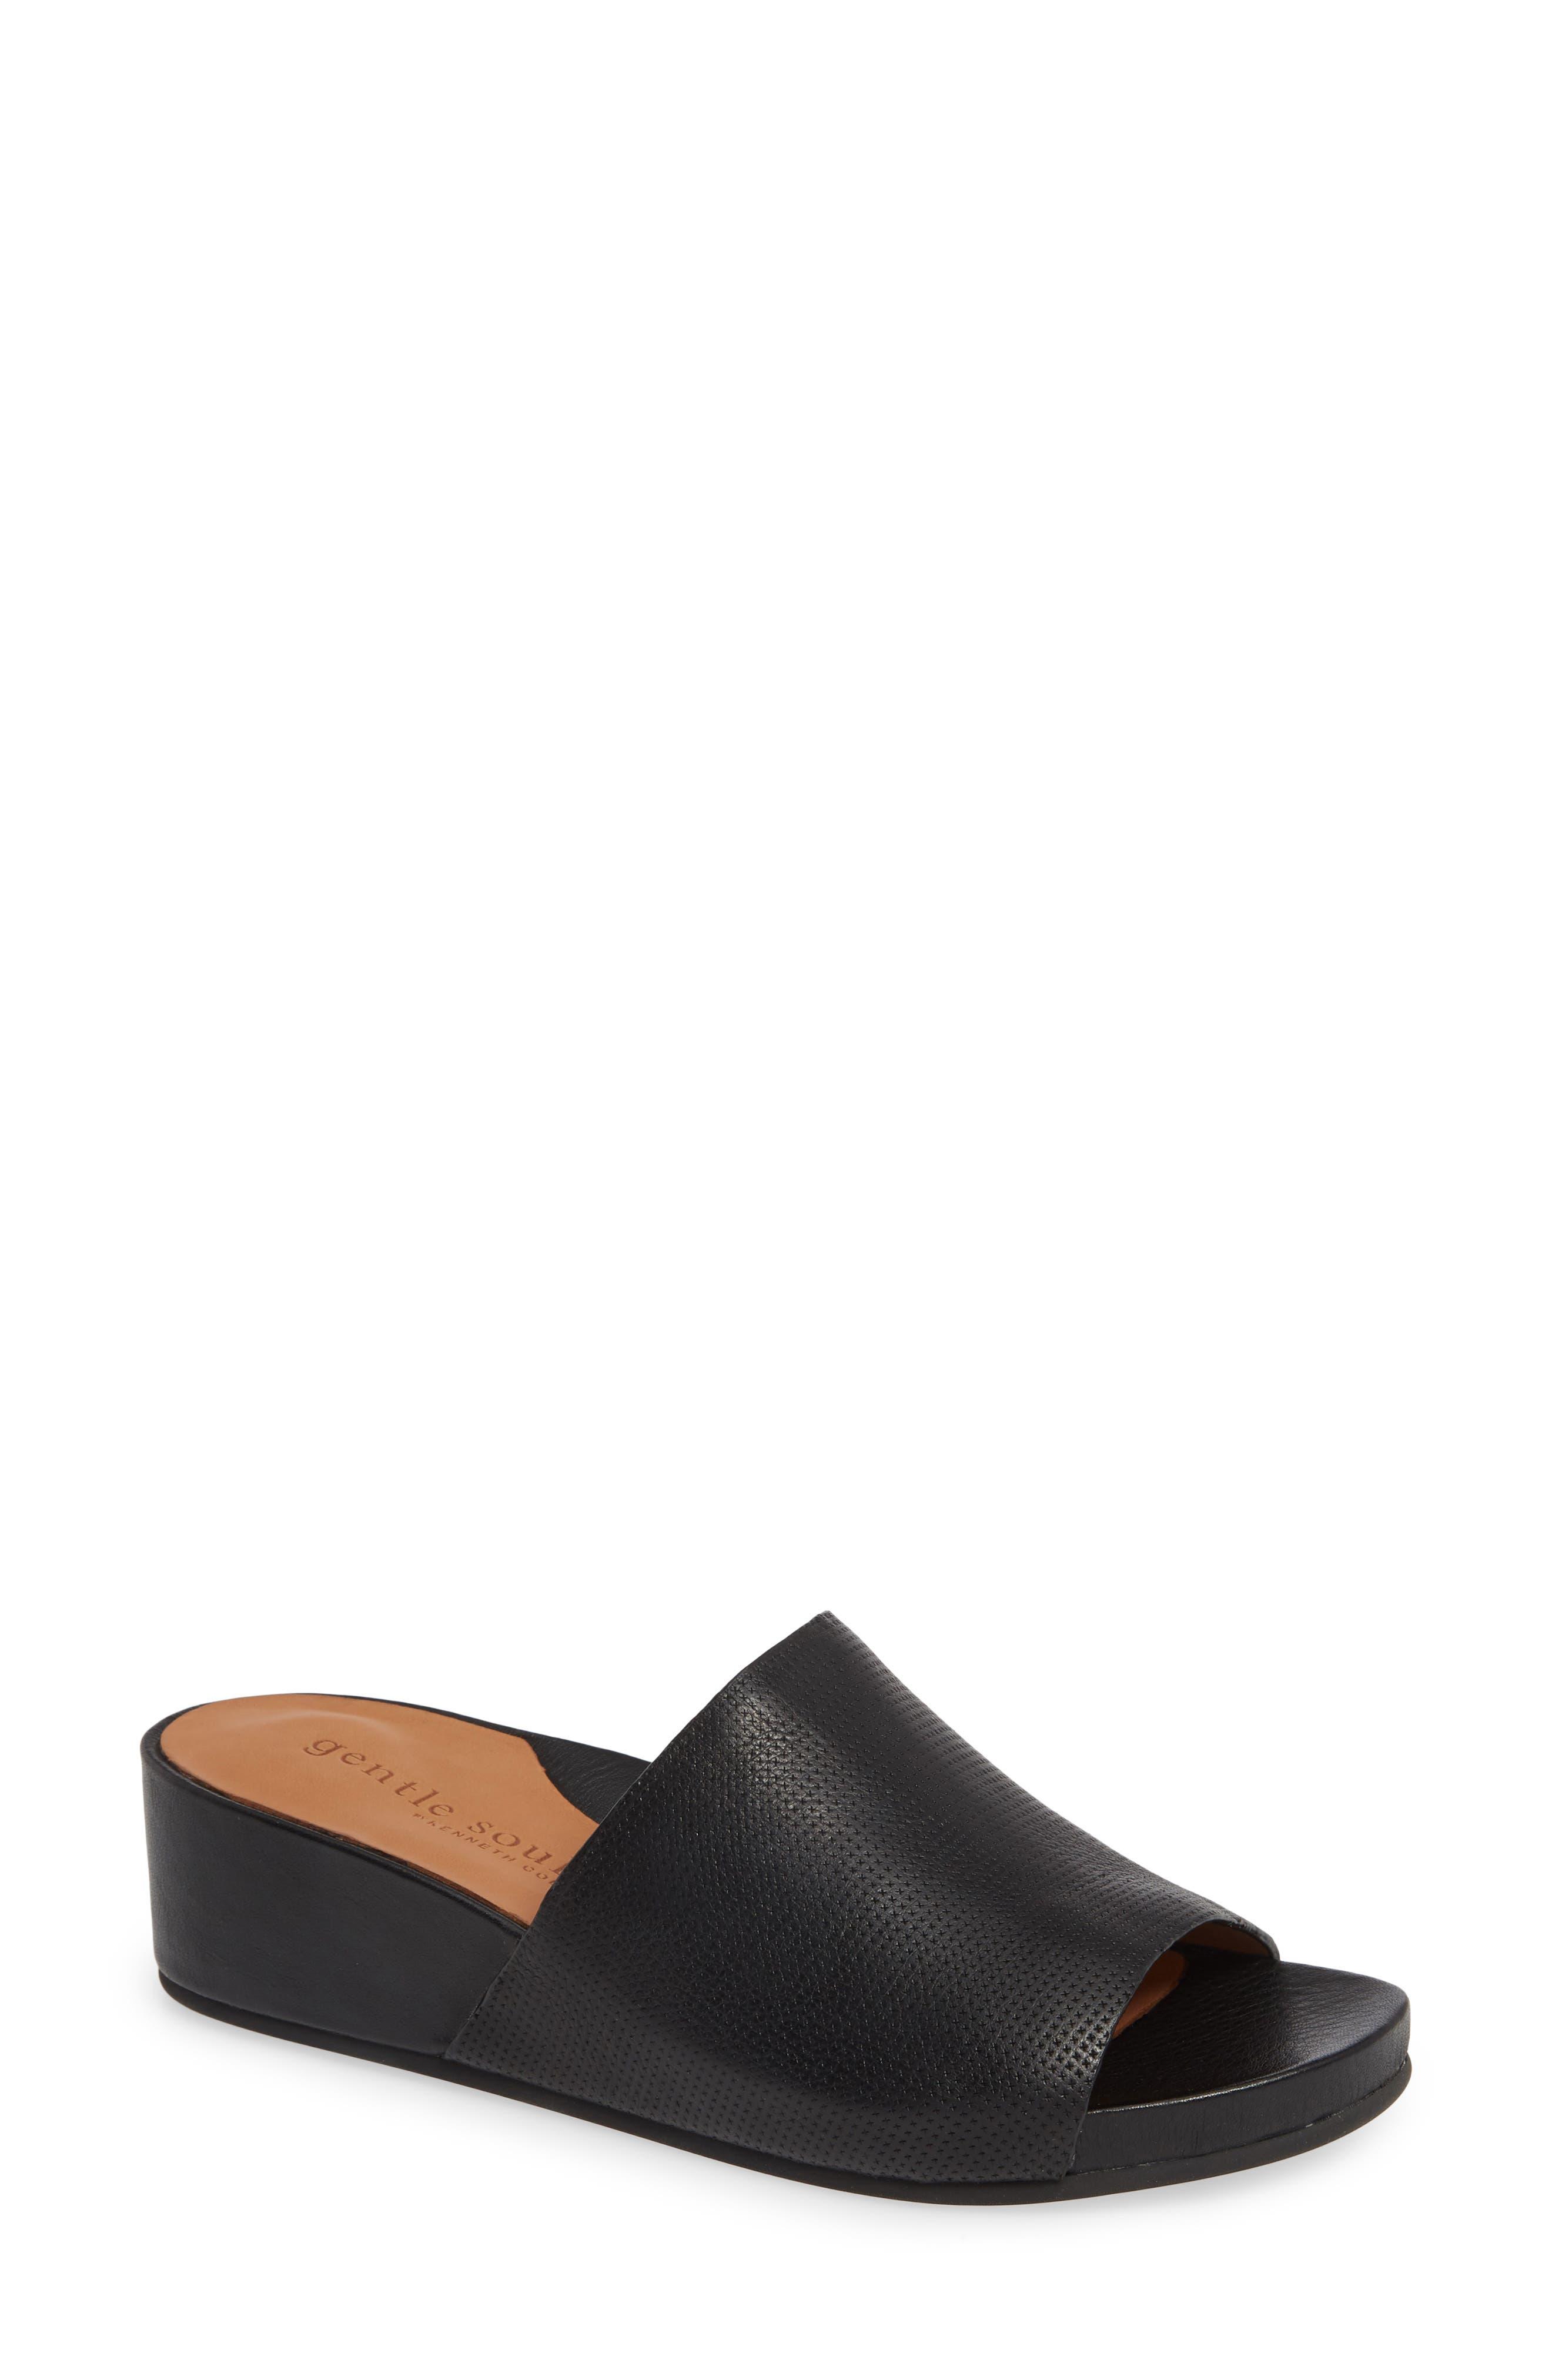 Gisele Wedge Slide Sandal, Main, color, BLACK LEATHER